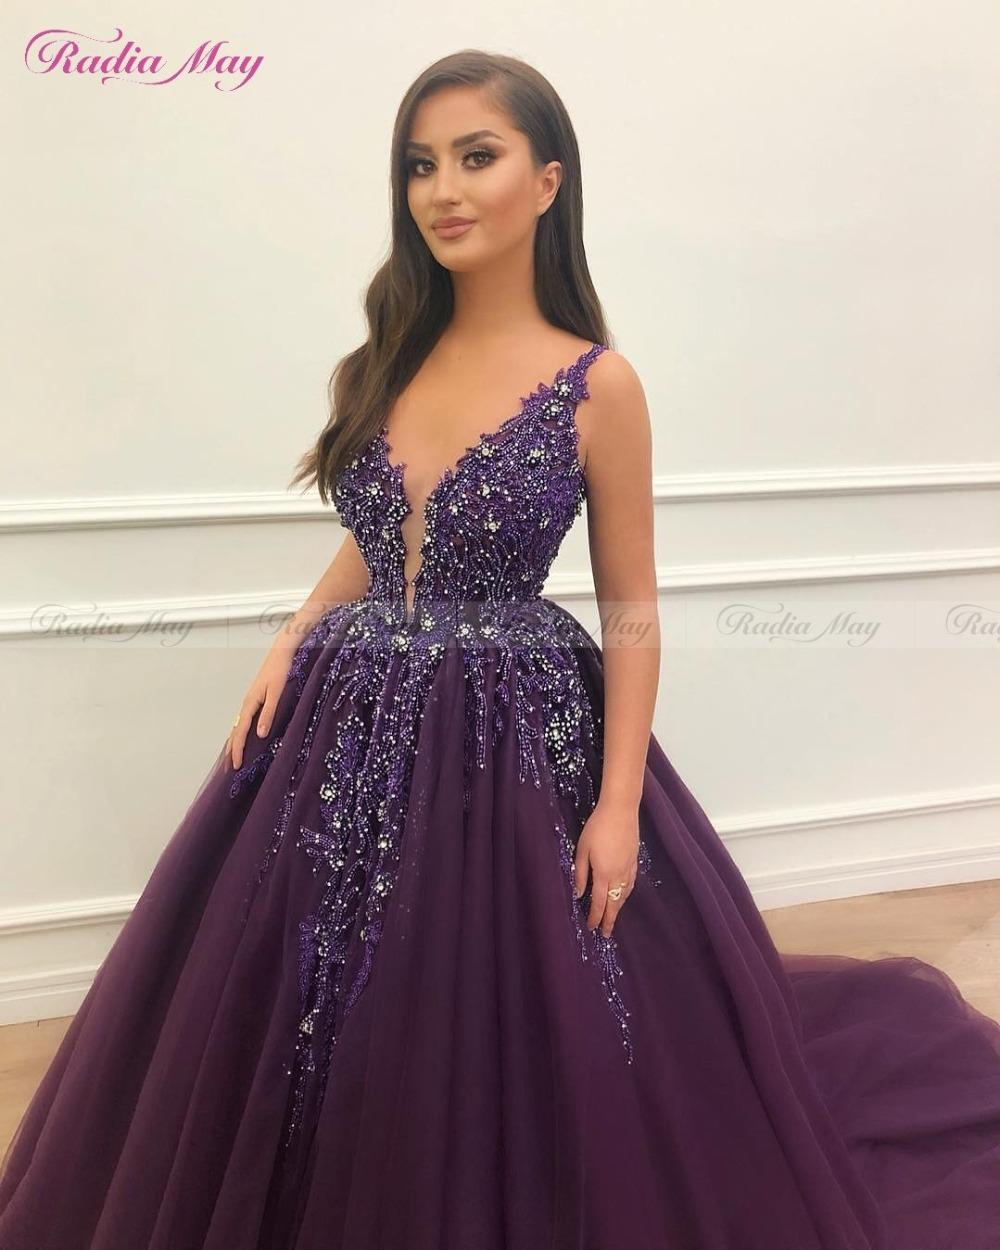 2019 Arabic Purple Tulle Ball Gowns Evening Dresses Beaded V Neck Robe de Soriee Dubai Women Long Prom Formal Dress Party Gowns-in Evening Dresses from Weddings & Events    1